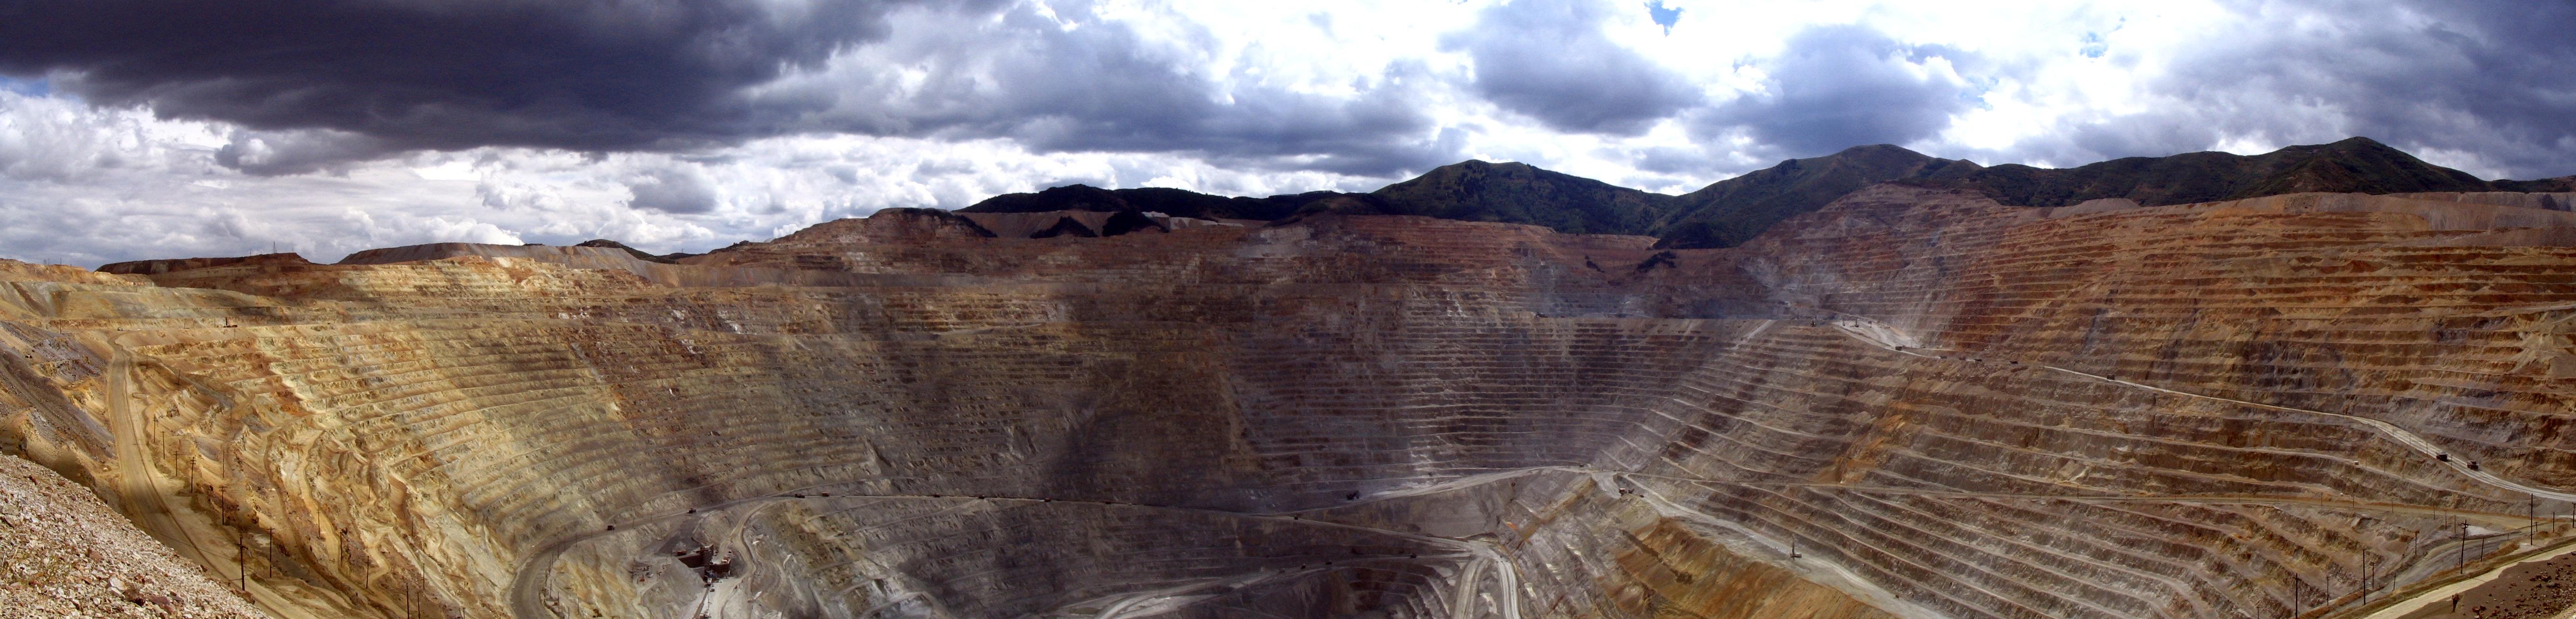 Bingham Copper Mine Panoramic Wikipedia